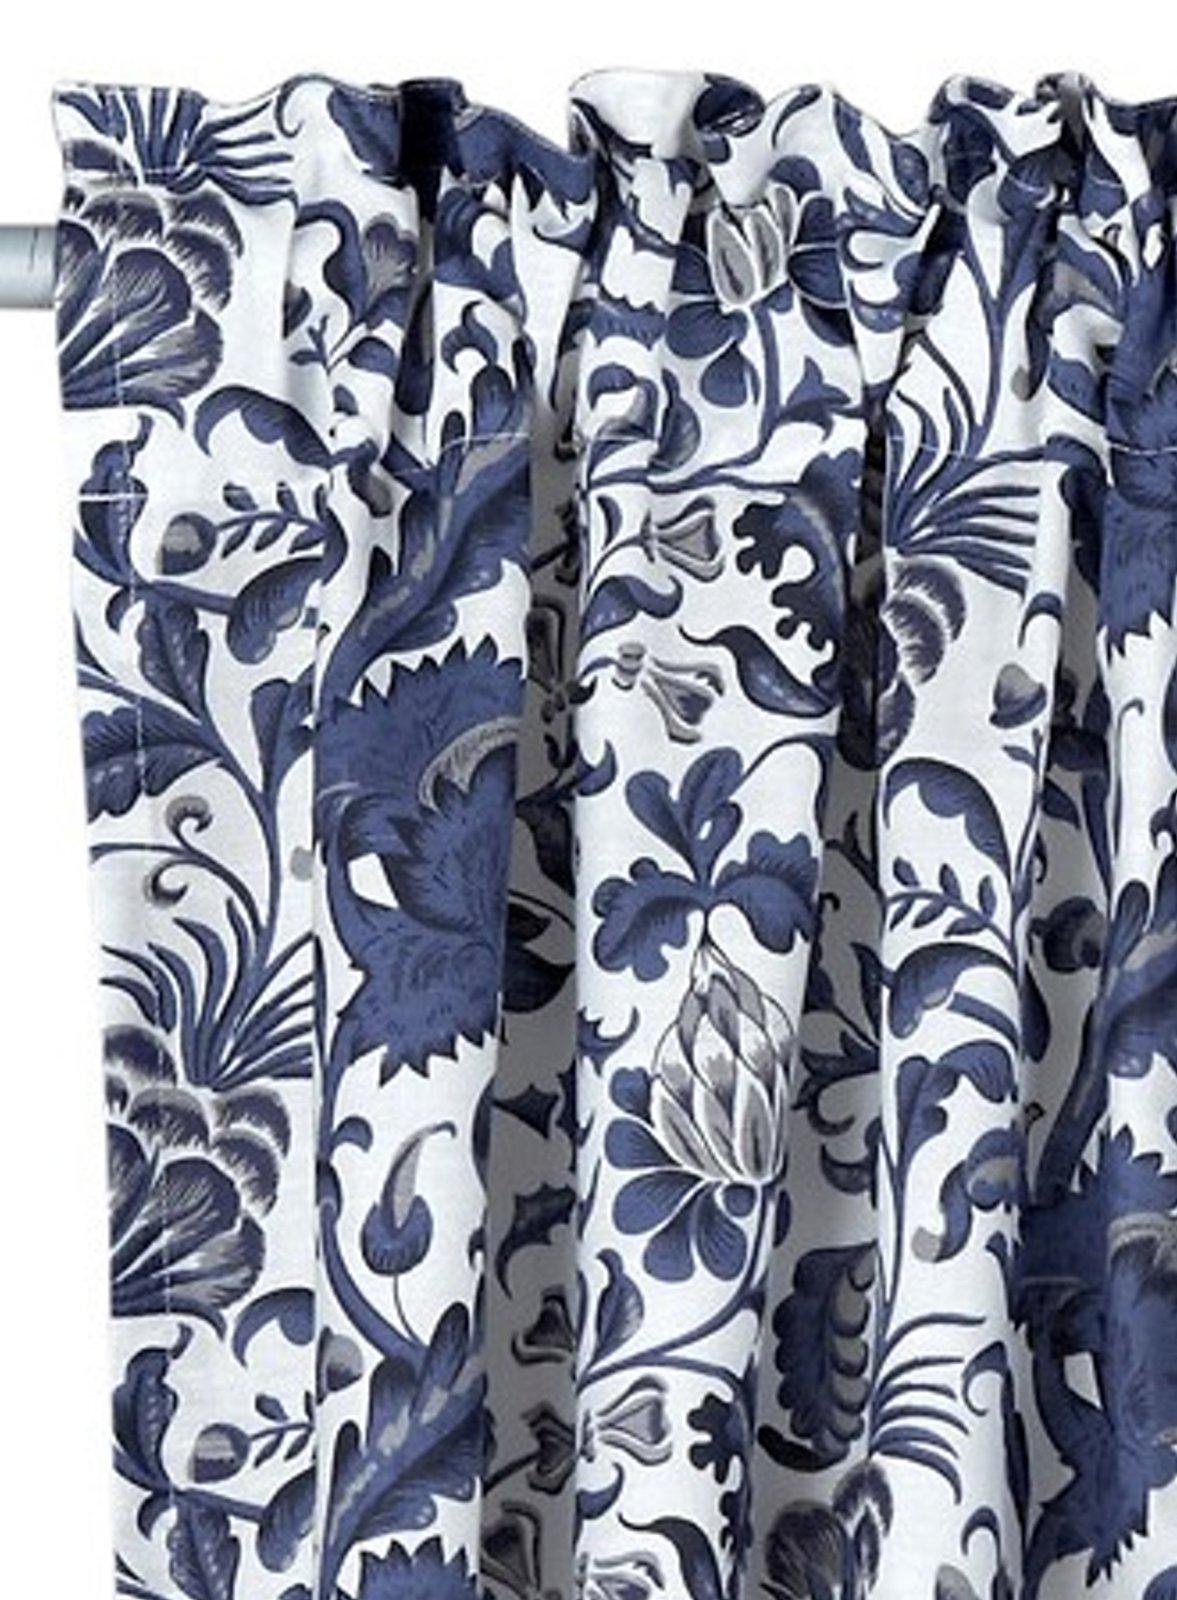 Ikea curtains blue - Ikea Curtains Blue 28